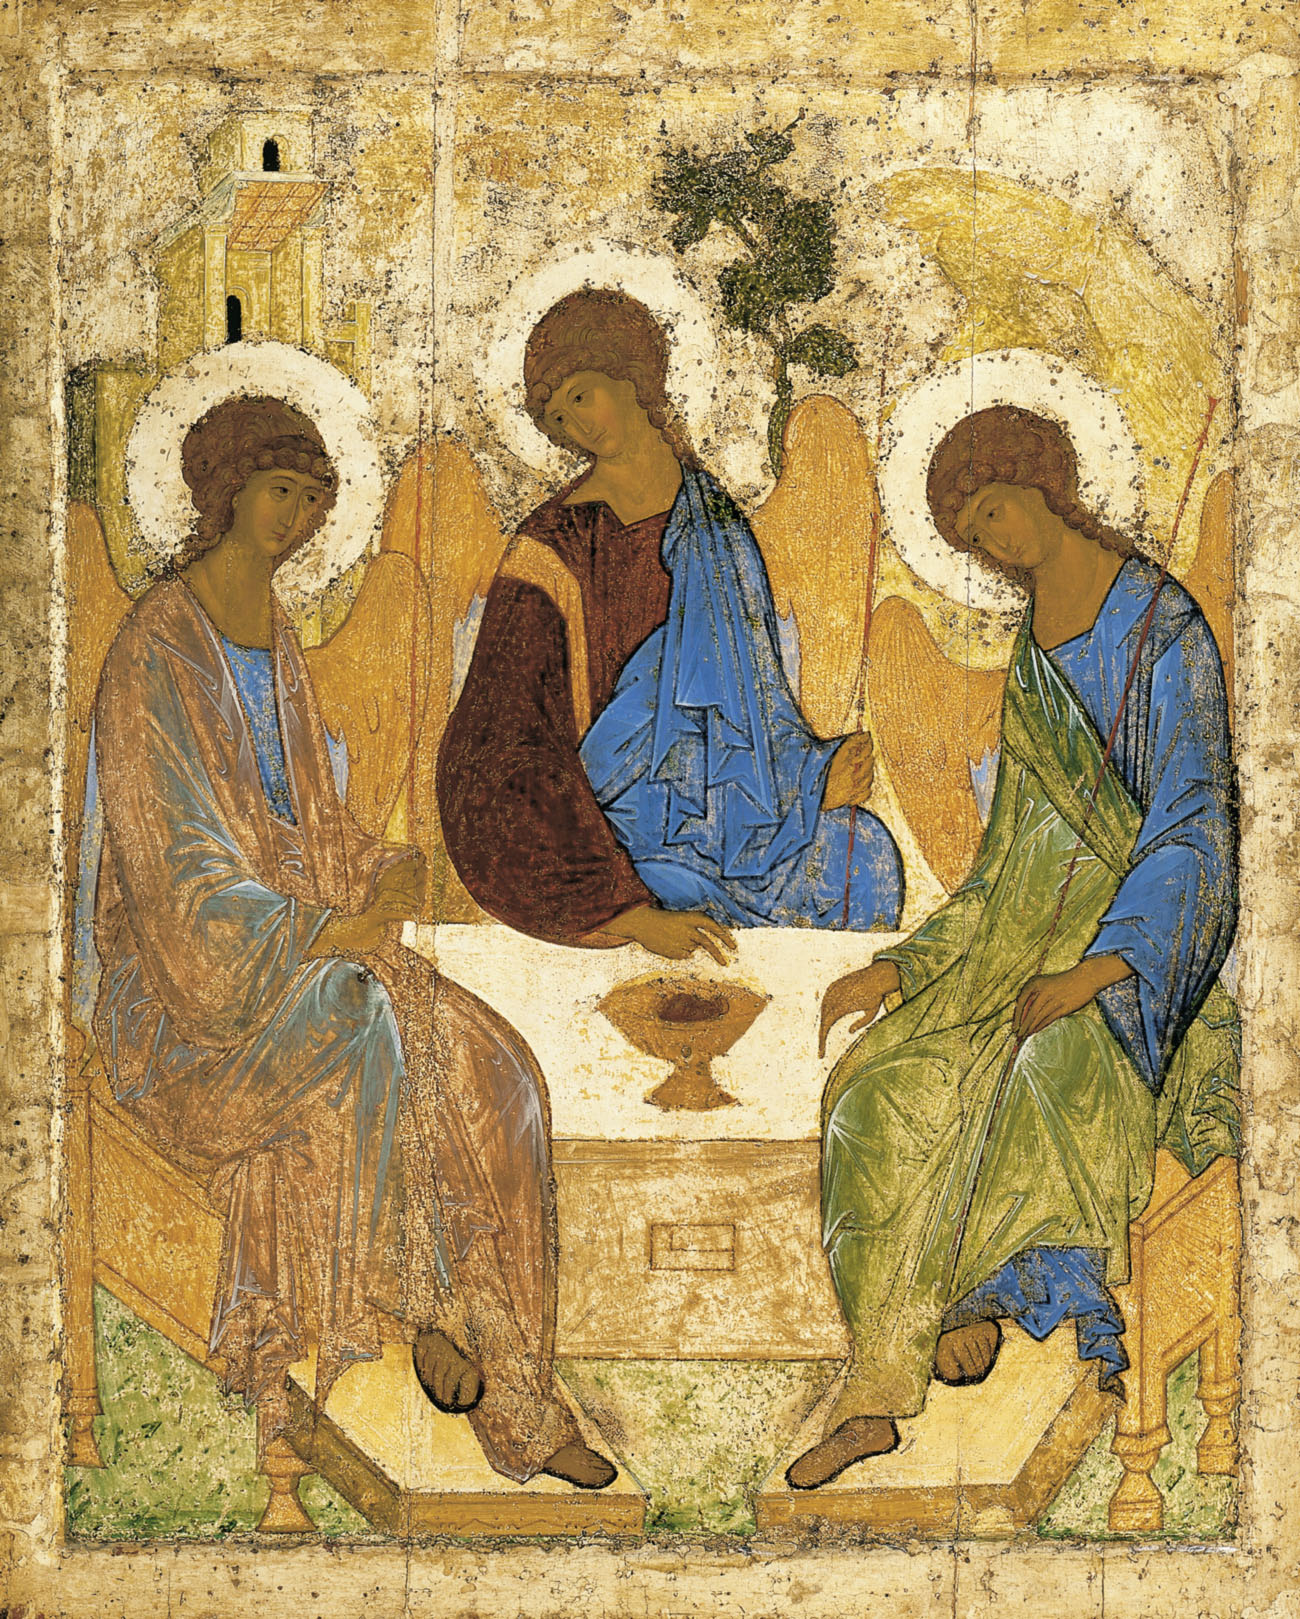 [Philip Fedchin, Senior Lecturer, Smolny College] Andrei Rublev, Trinity, 15th Century